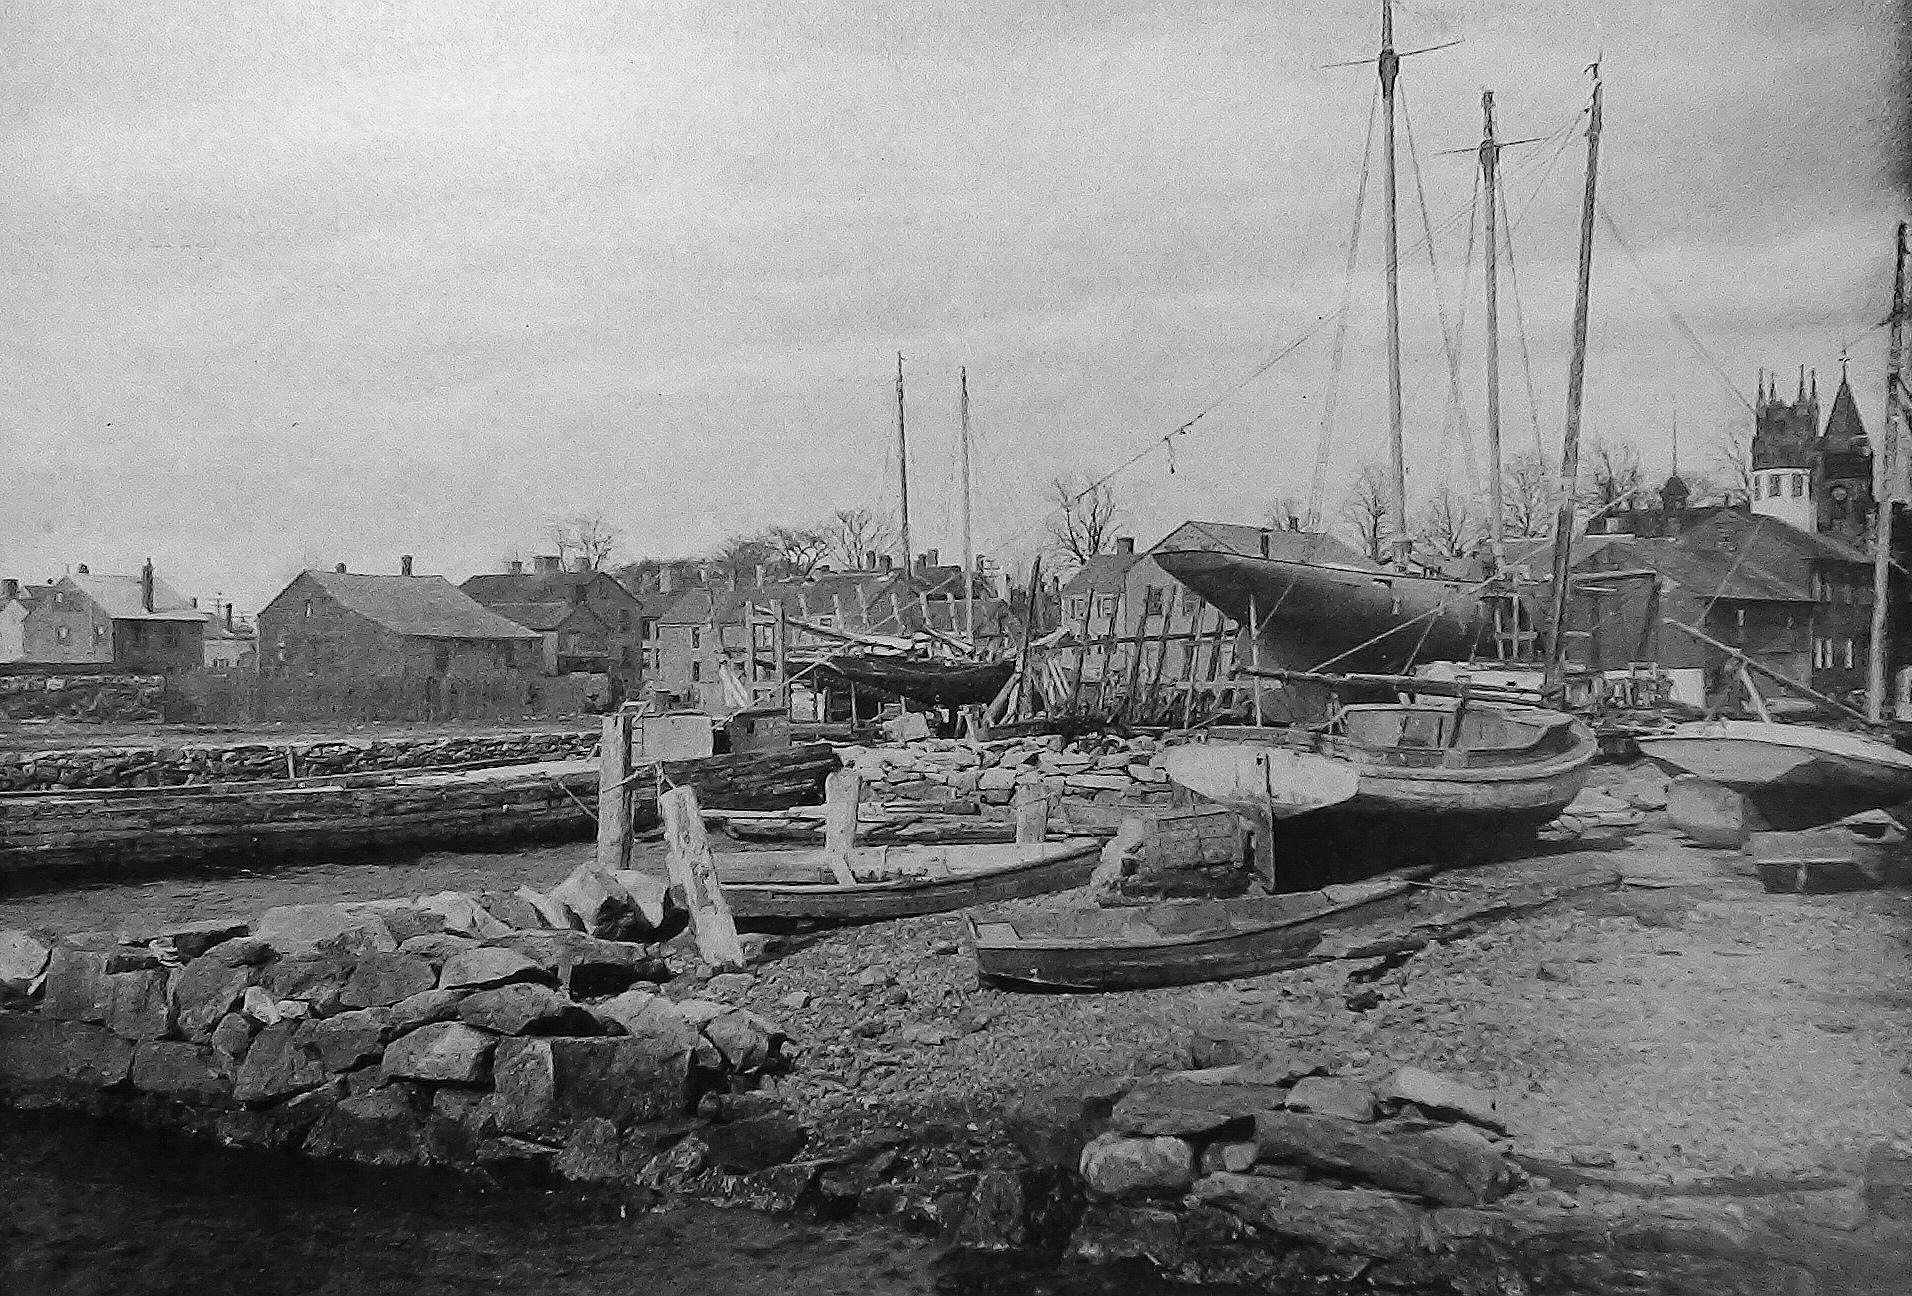 Kelly's Boat Yard Fairhaven, MA c1898